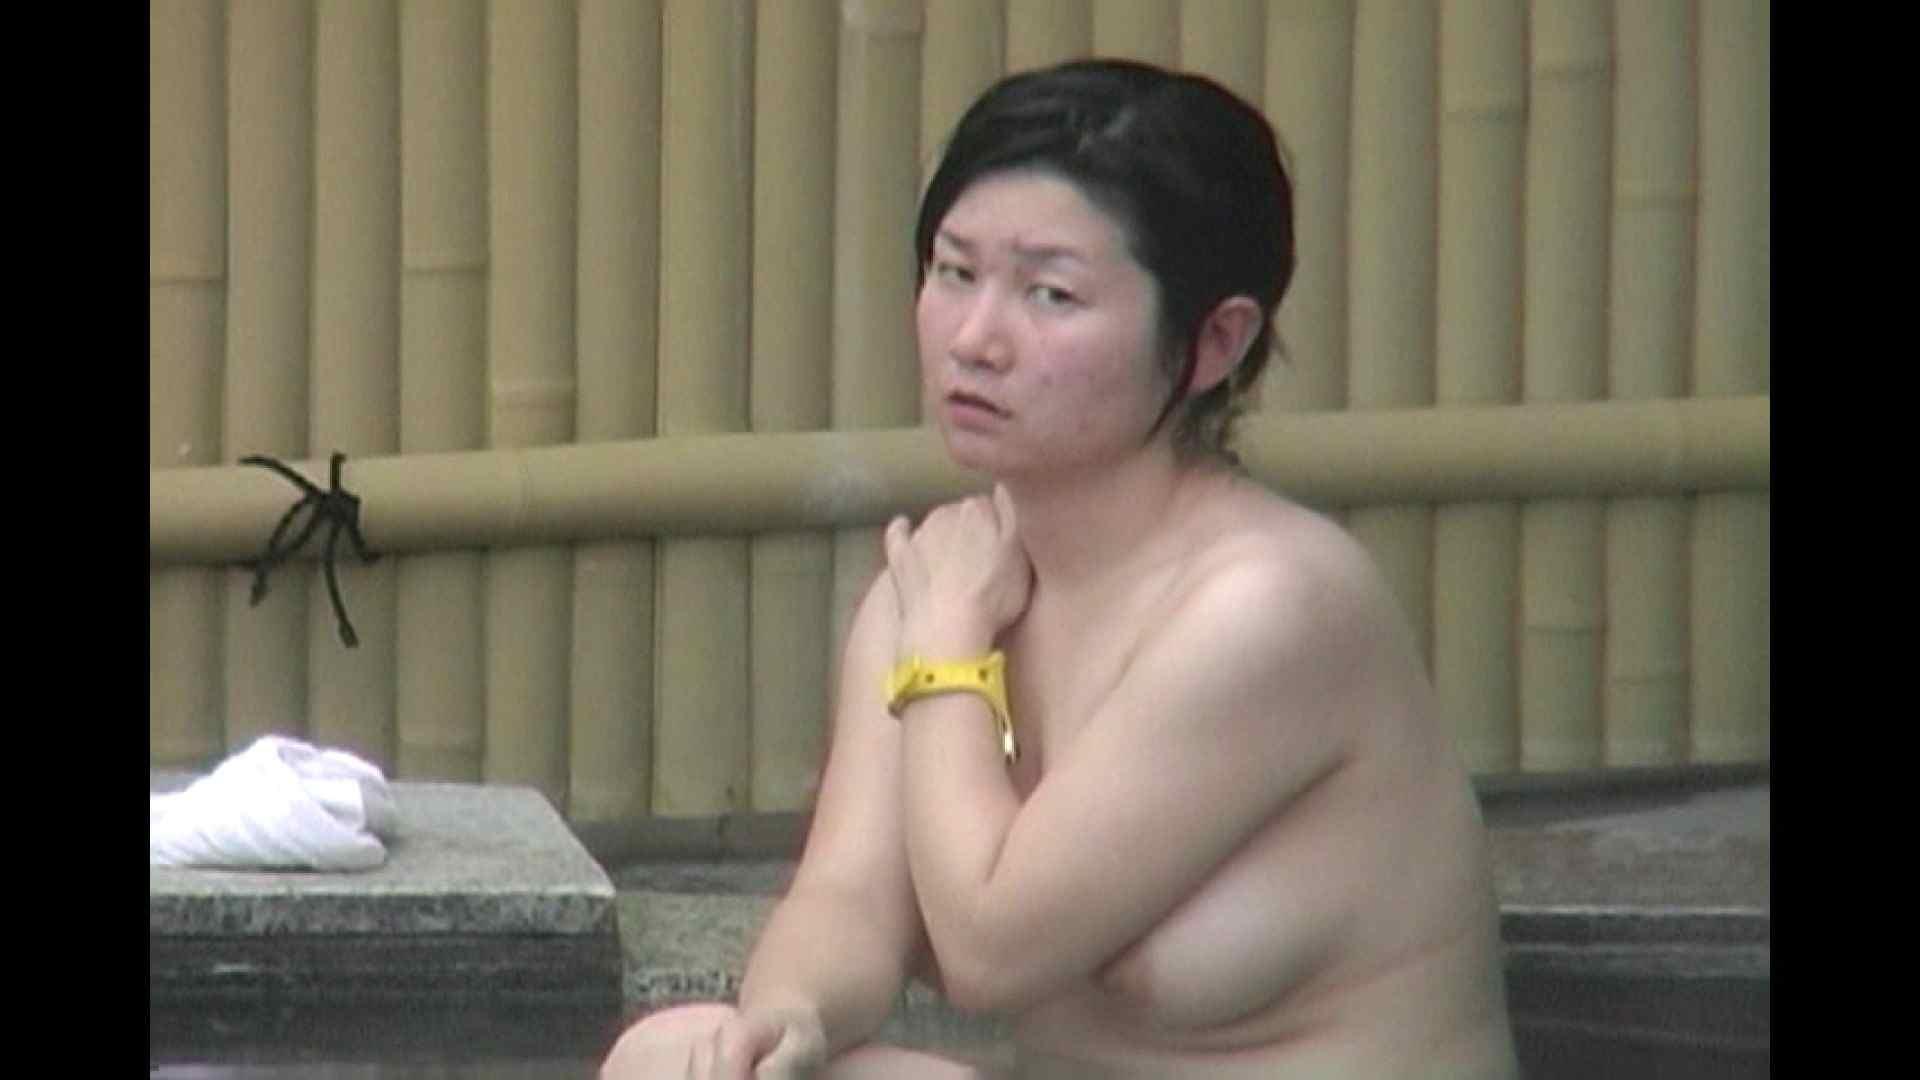 Aquaな露天風呂Vol.545 盗撮 | OLセックス  56画像 10